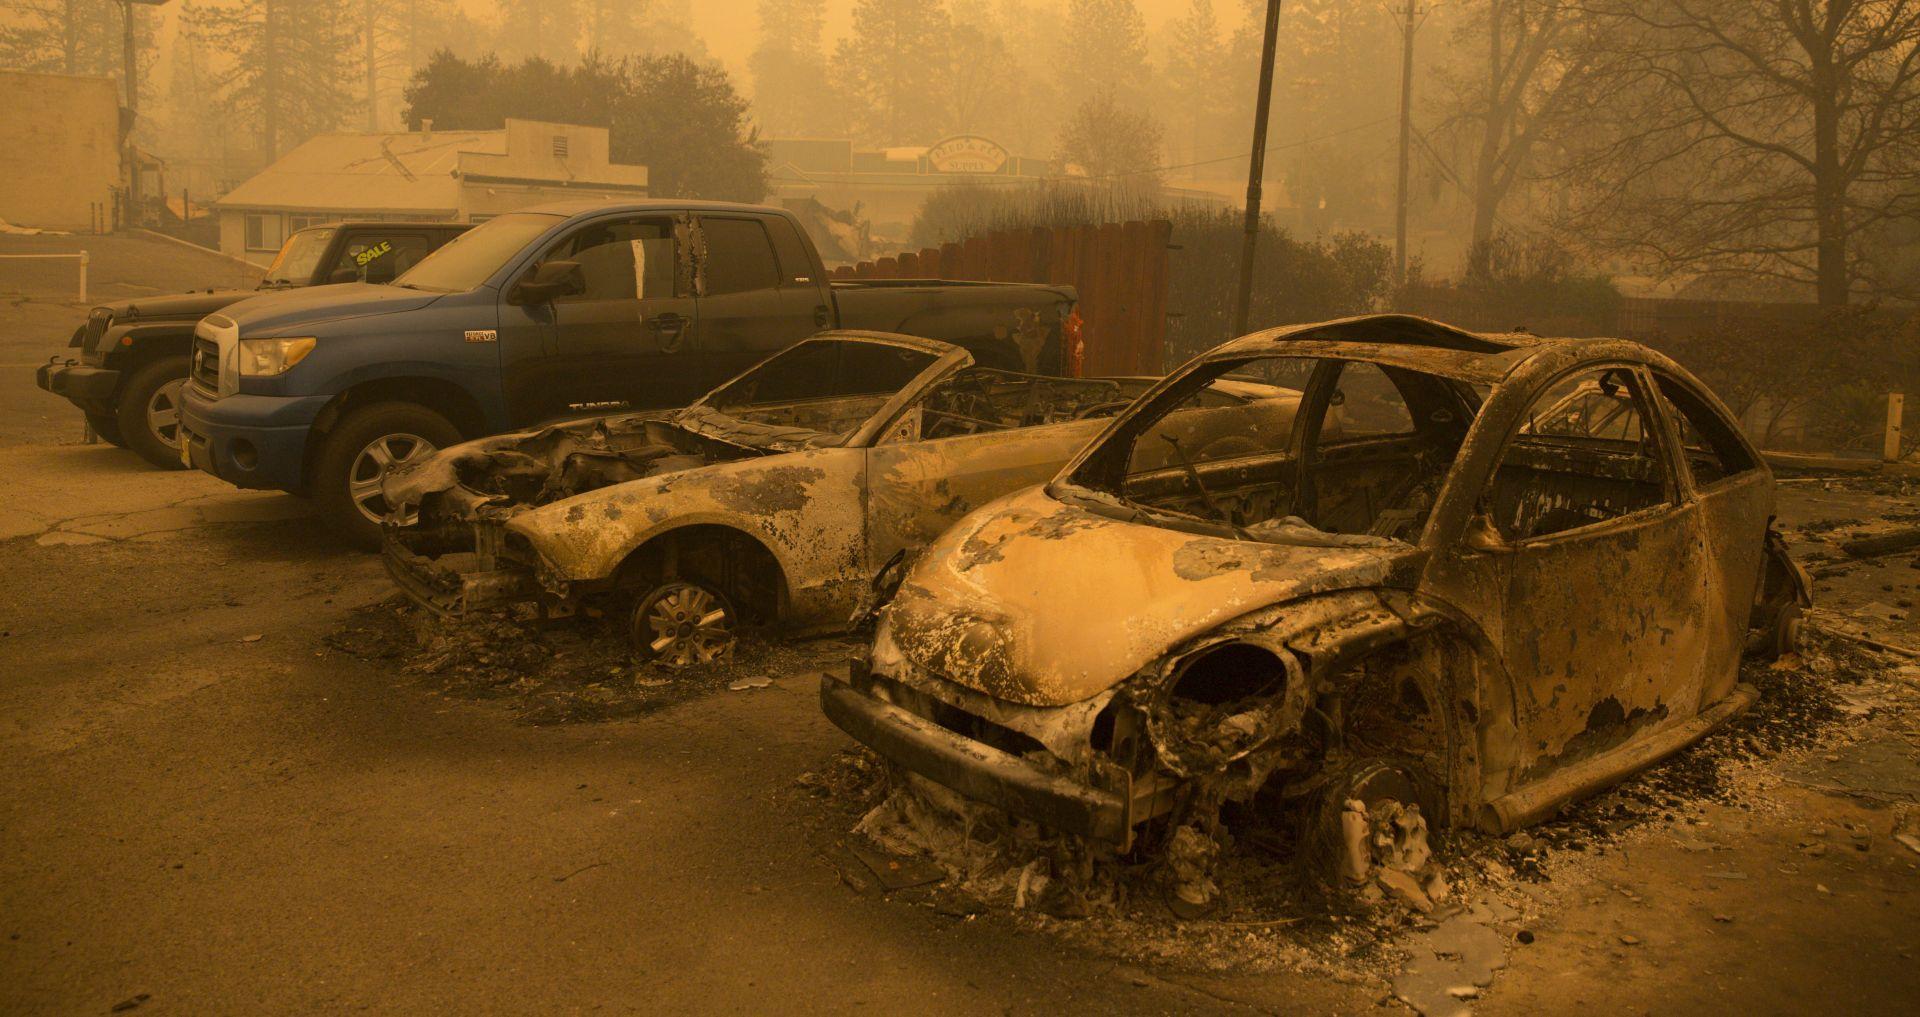 KALIFORNIJA Potvrđeno 63 poginulih, broj nestalih narastao na 630